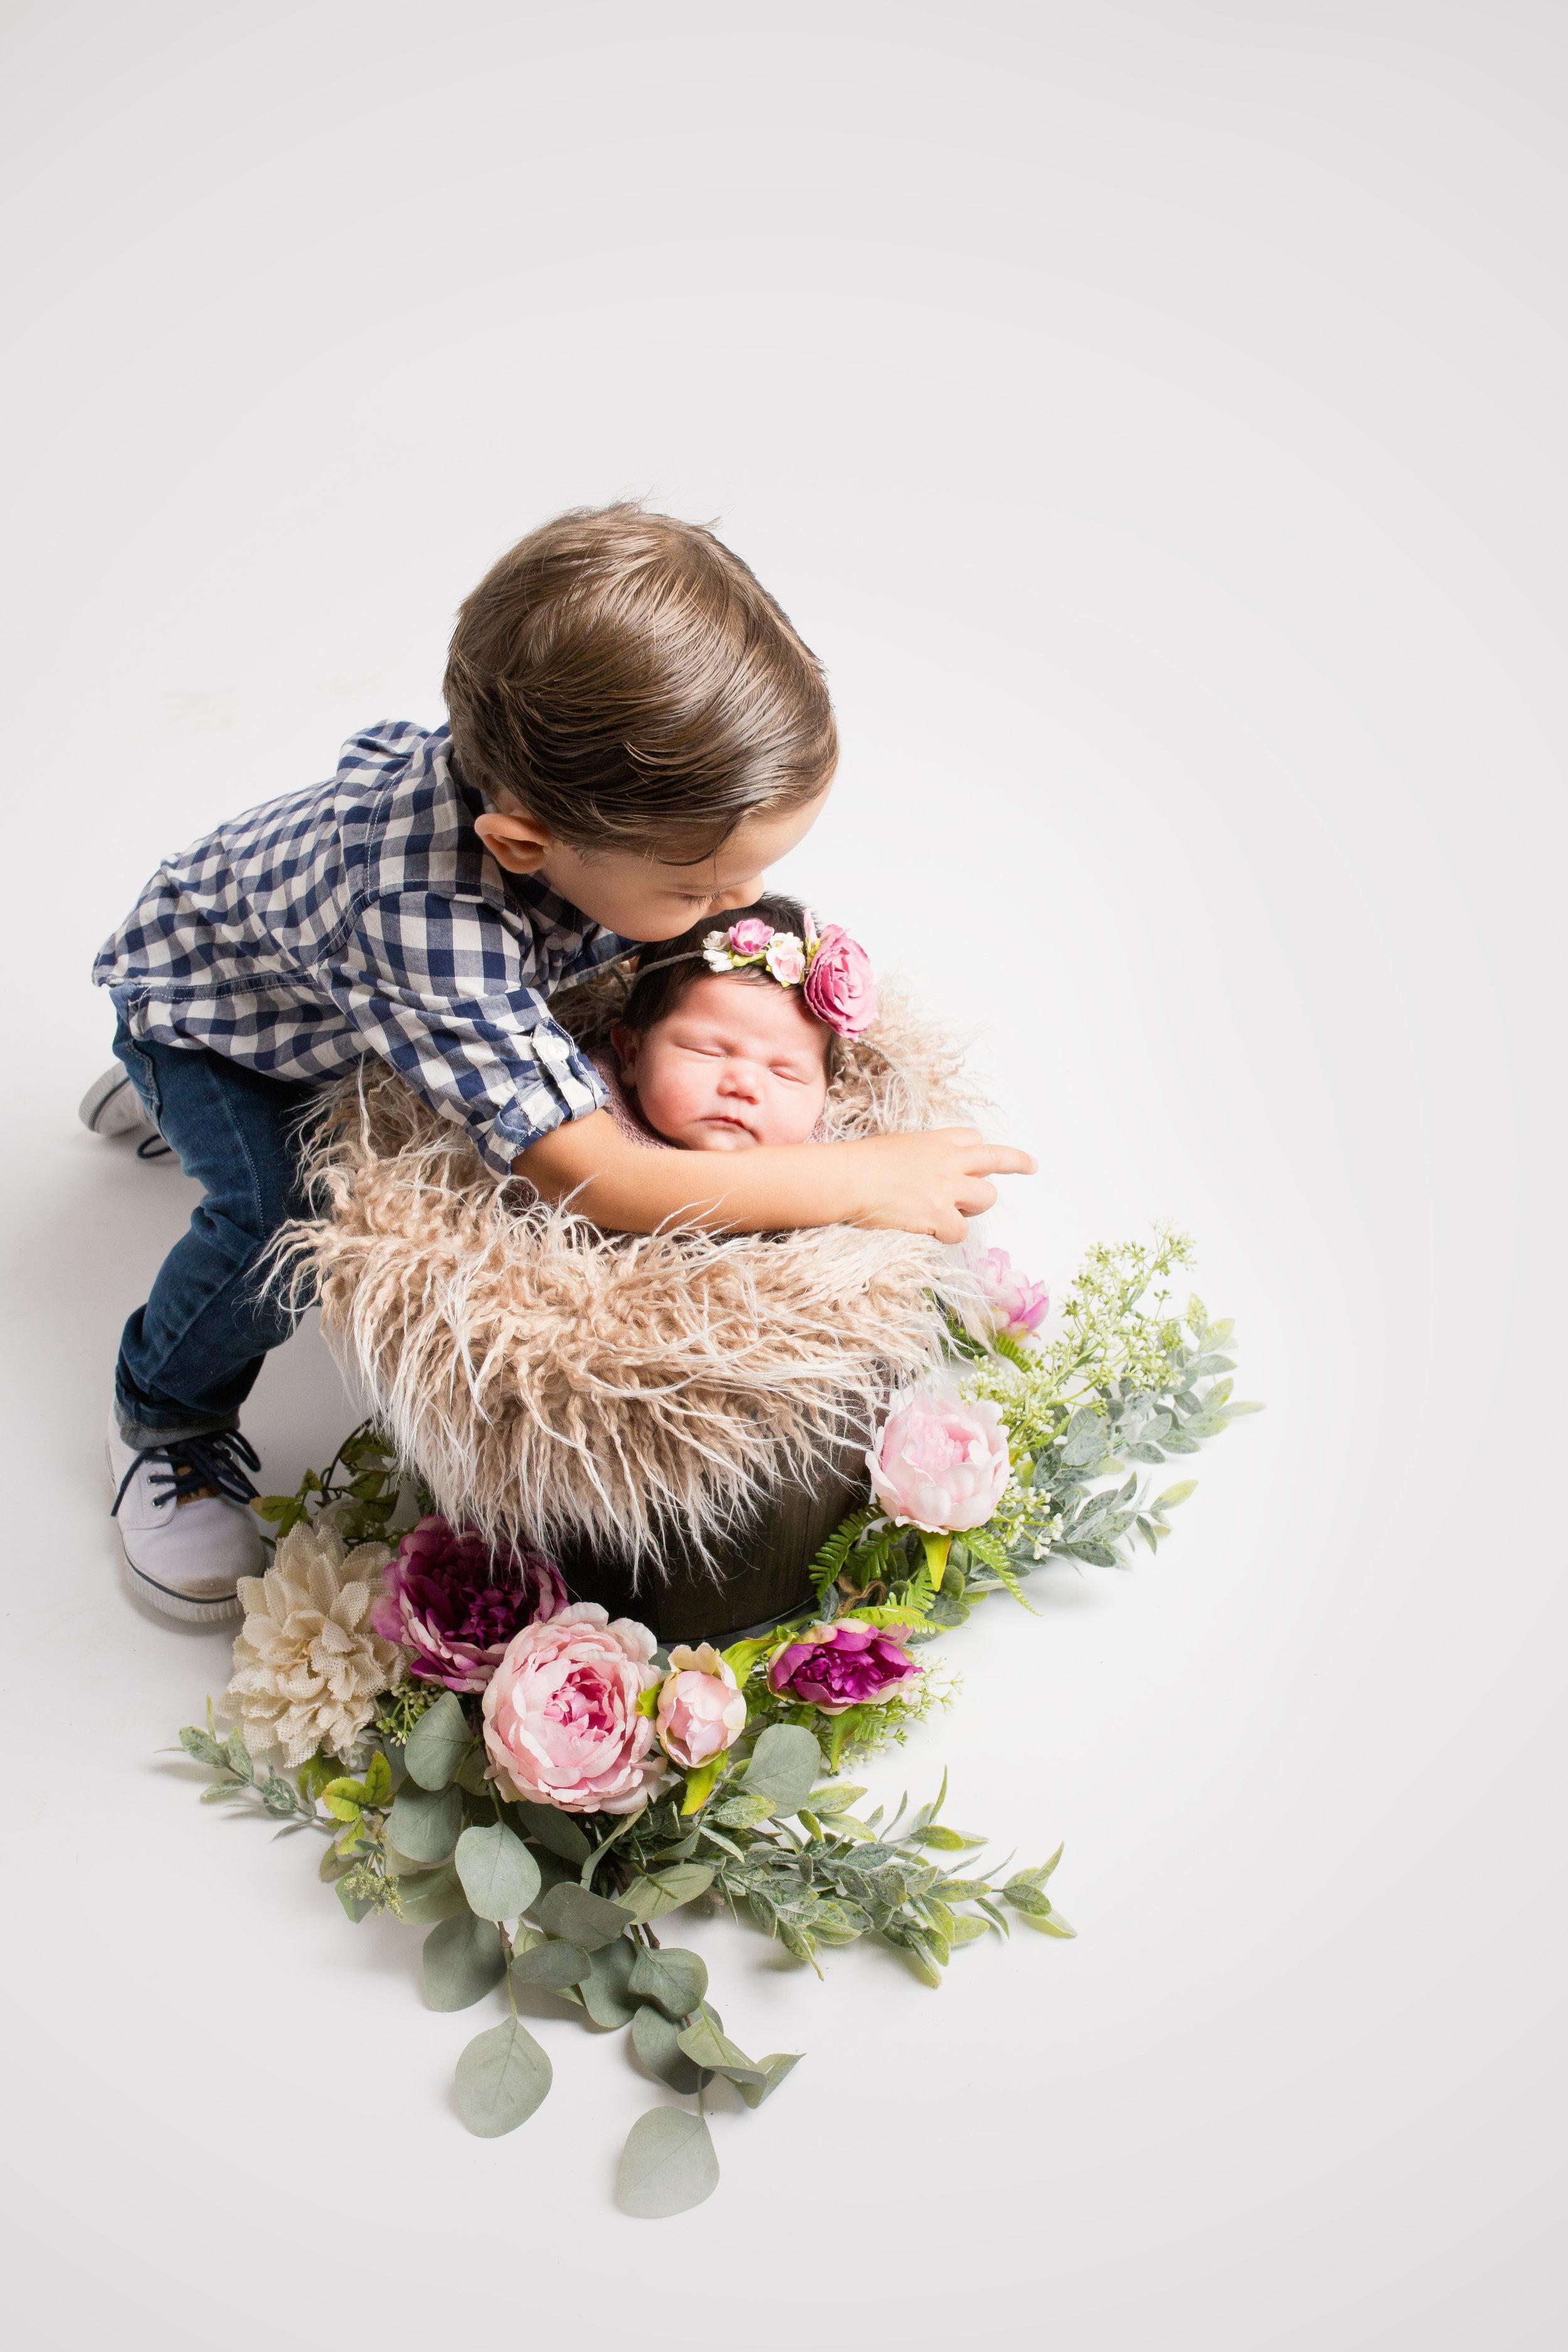 Big Brother's Sweet Kiss